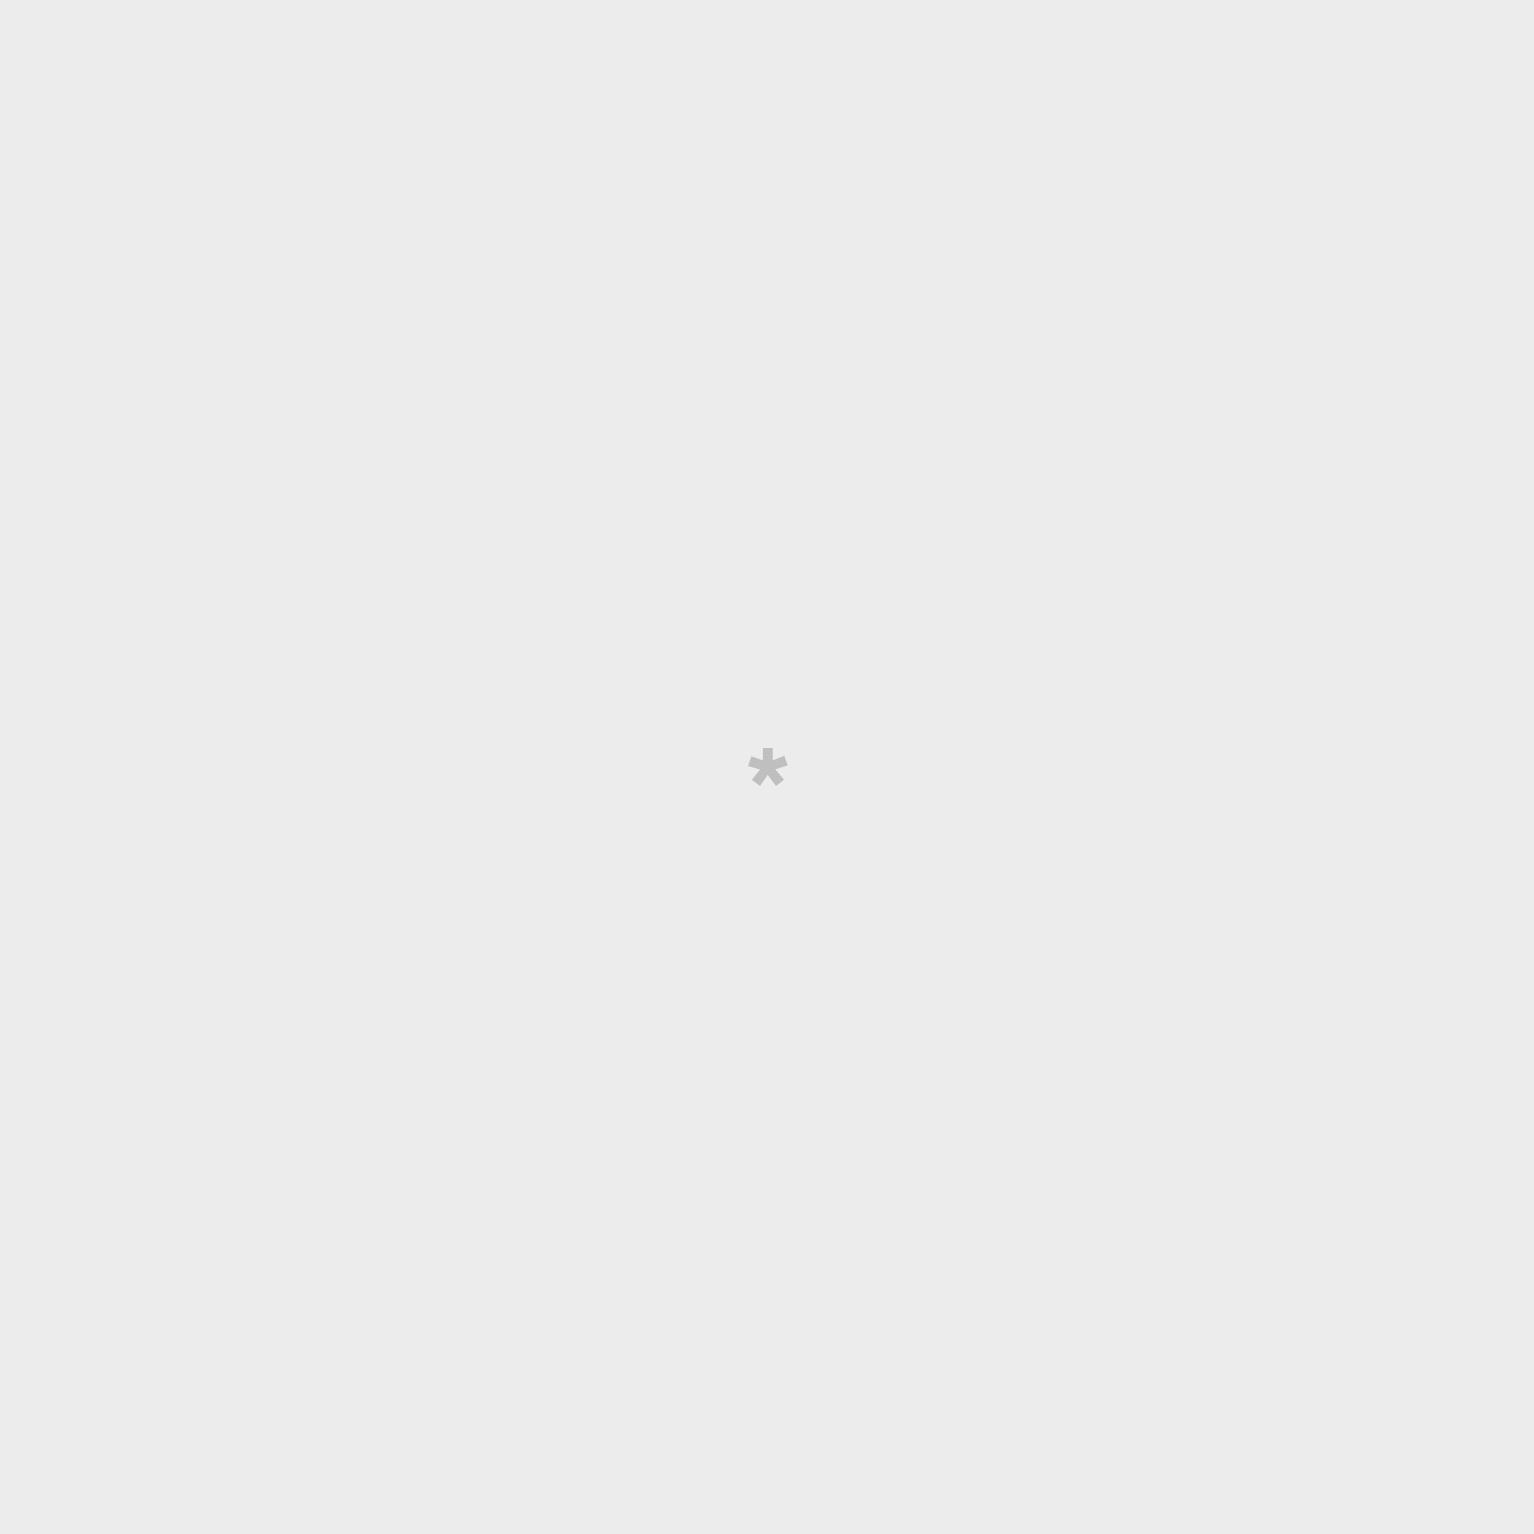 Planner di produttività - Qui c'è tempo per mettercela tutta